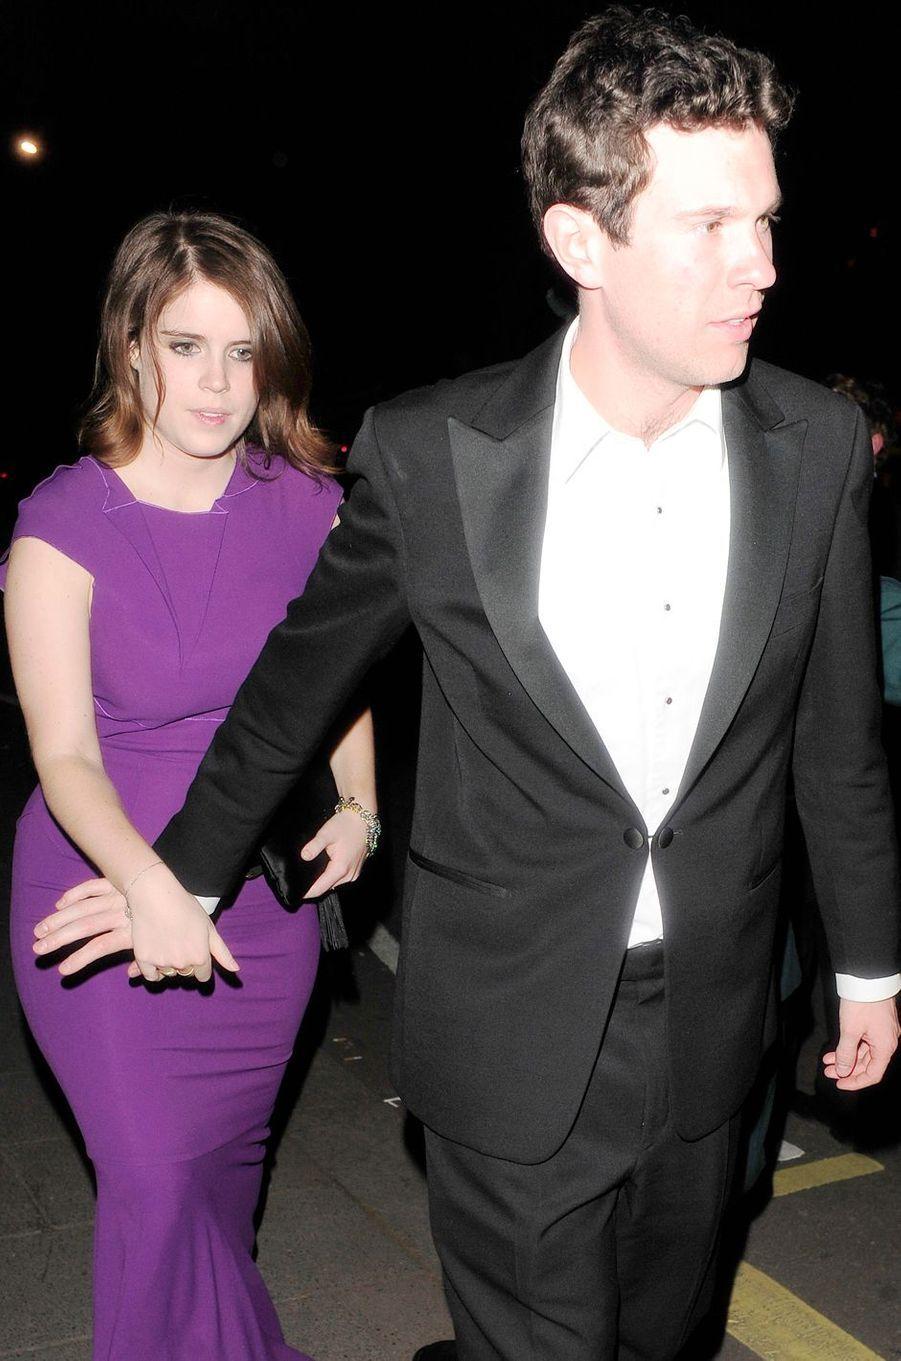 La princesse Eugenie d'York et Jack Brooksbank, le 16 mai 2014